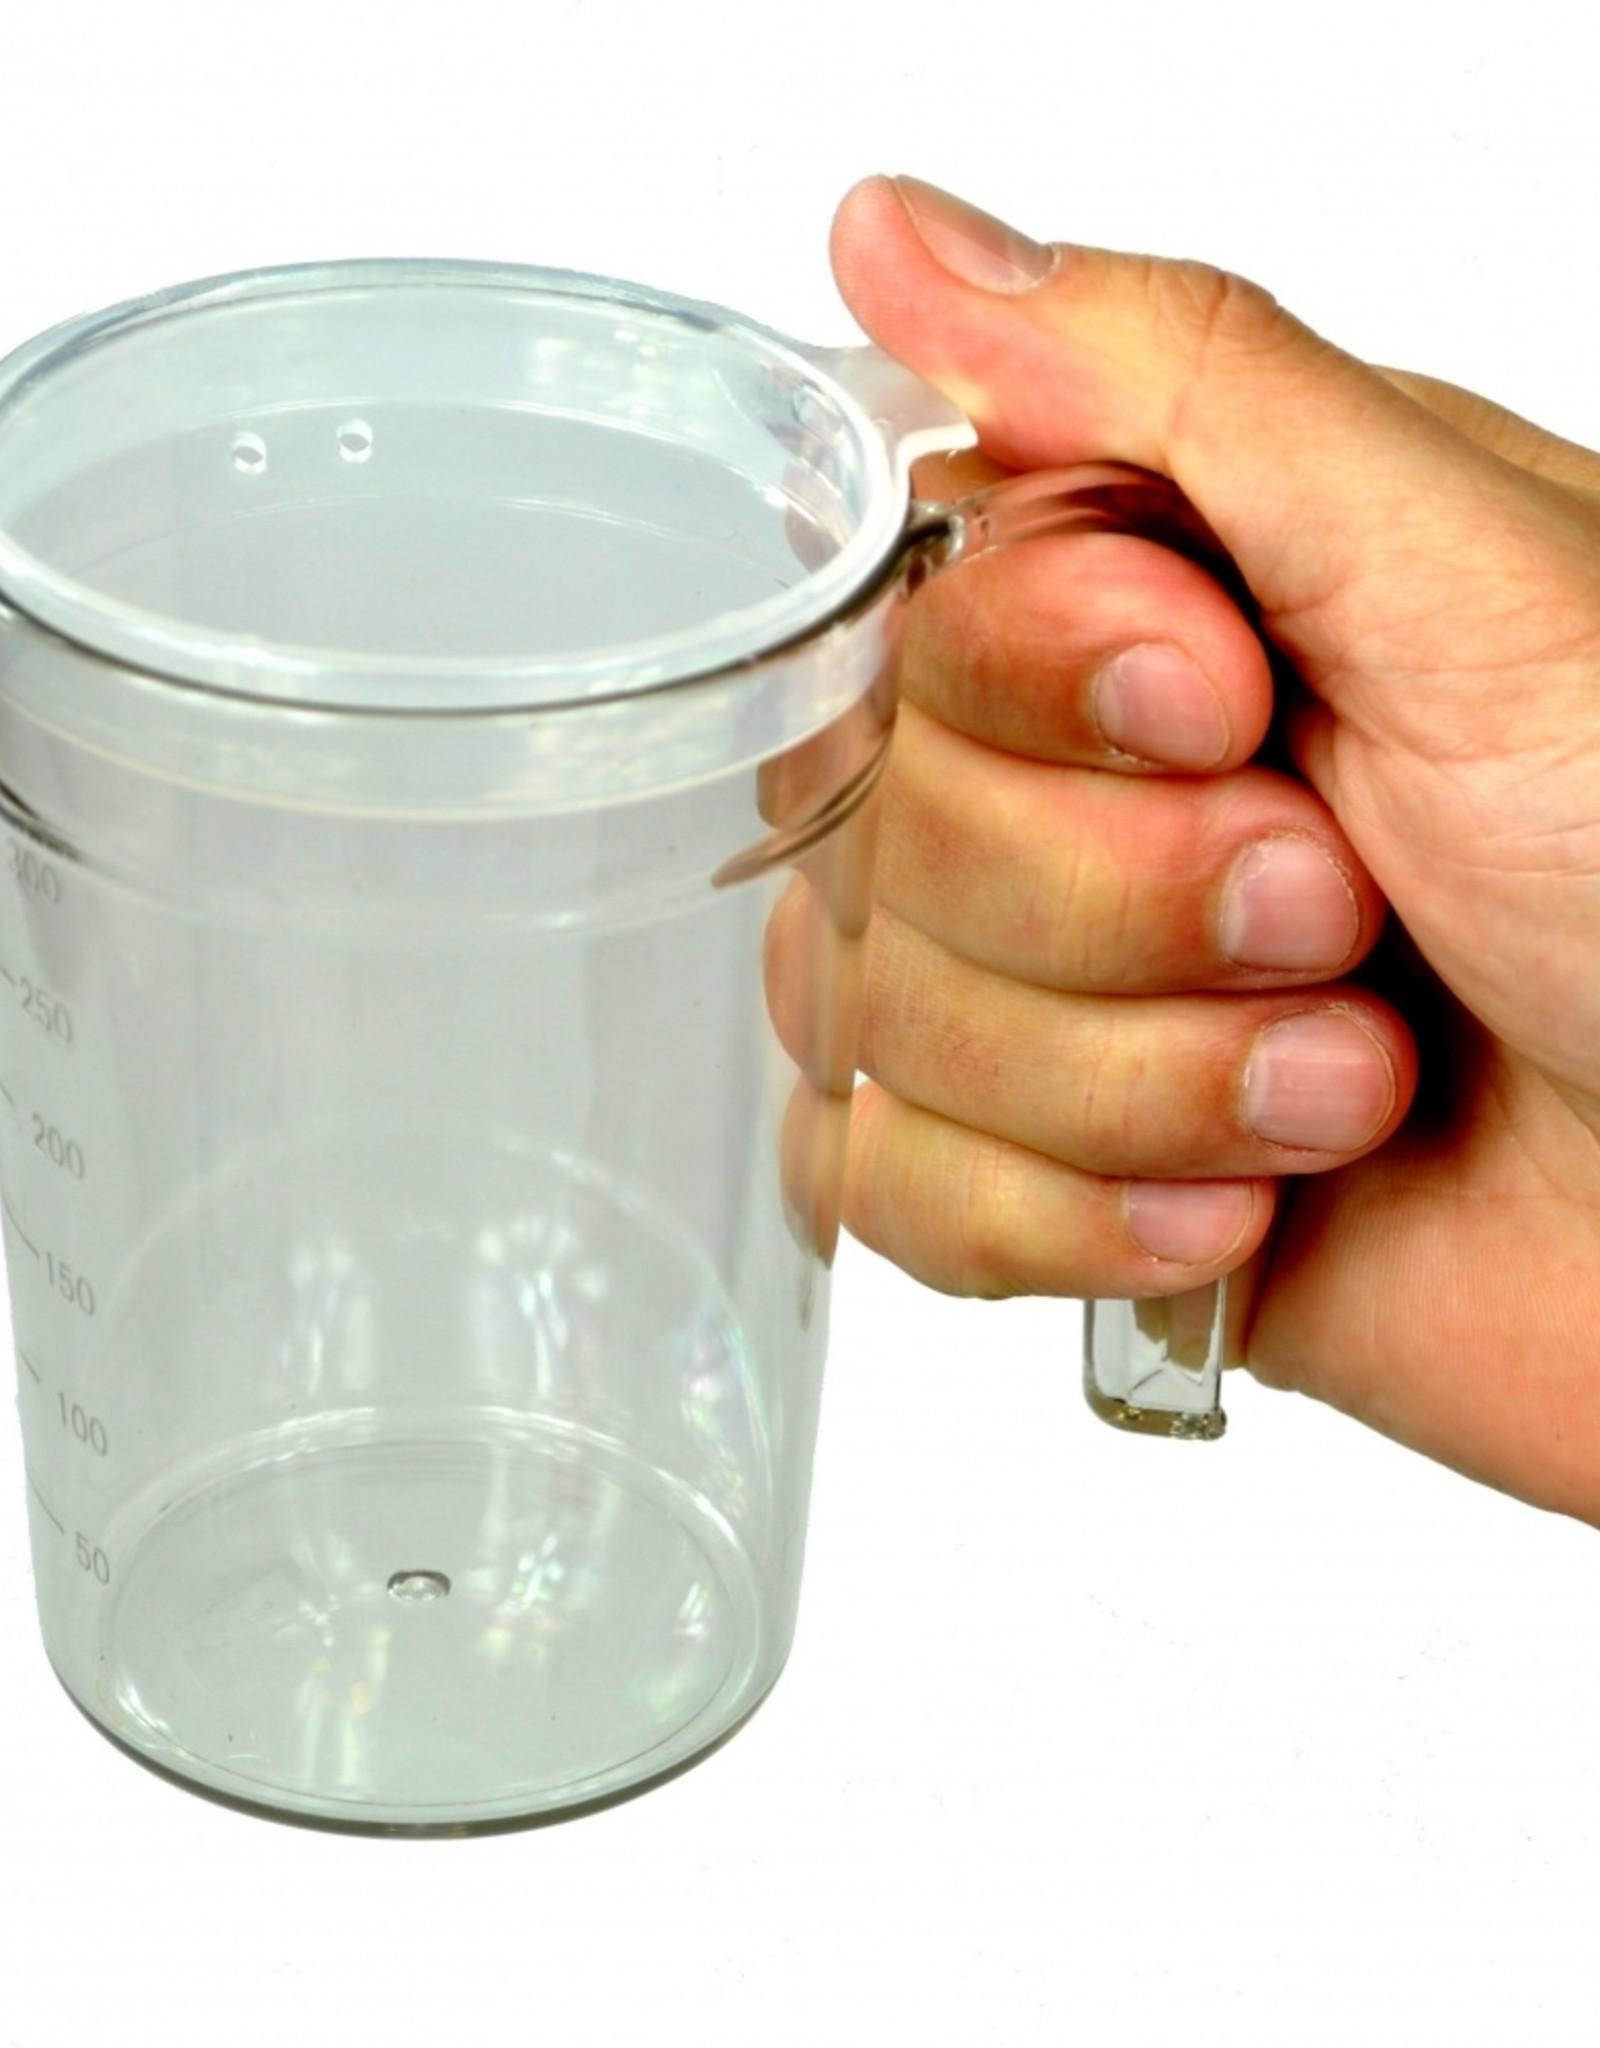 Drinkbeker met handvat